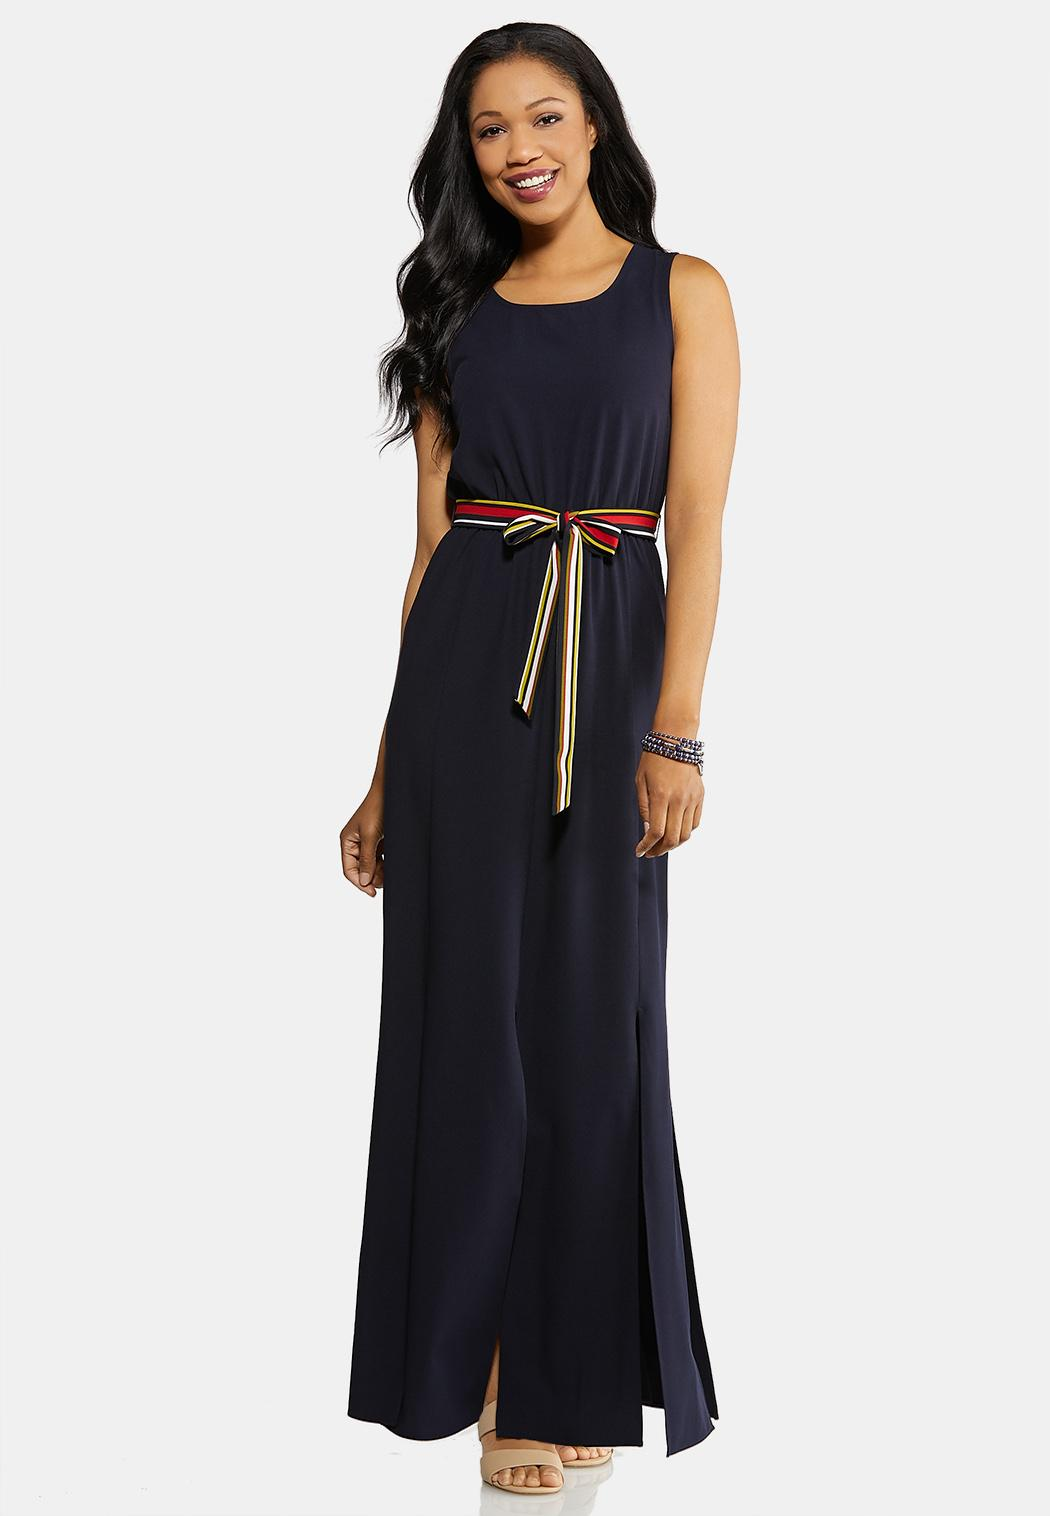 Plus Nautical Navy Belted Maxi Dress Plus Sizes Cato Fashions